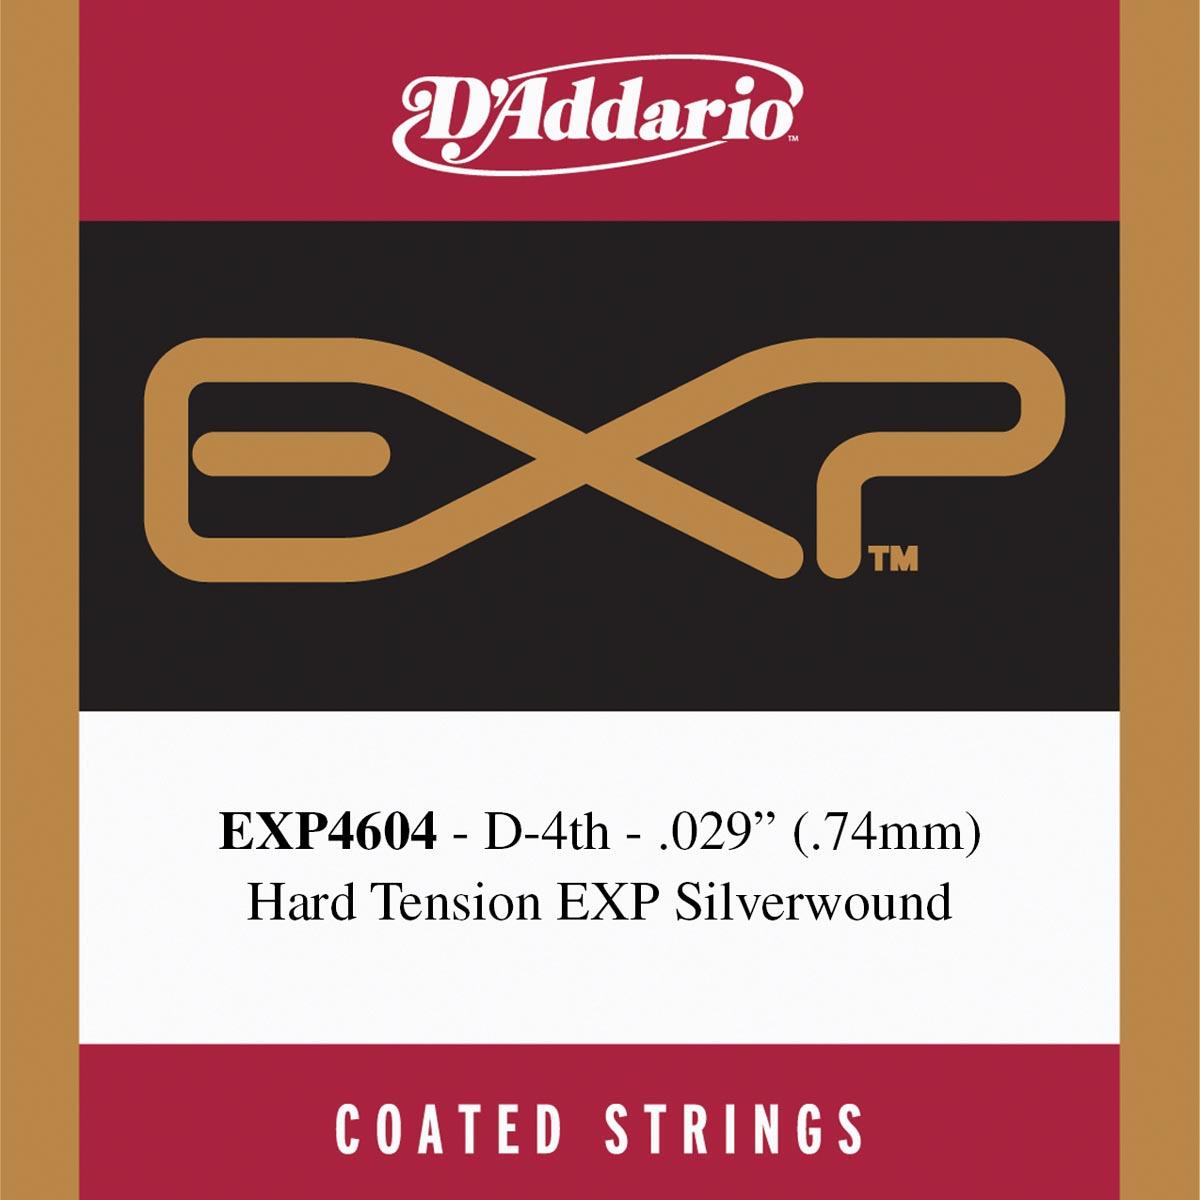 D'ADDARIO EXP4604